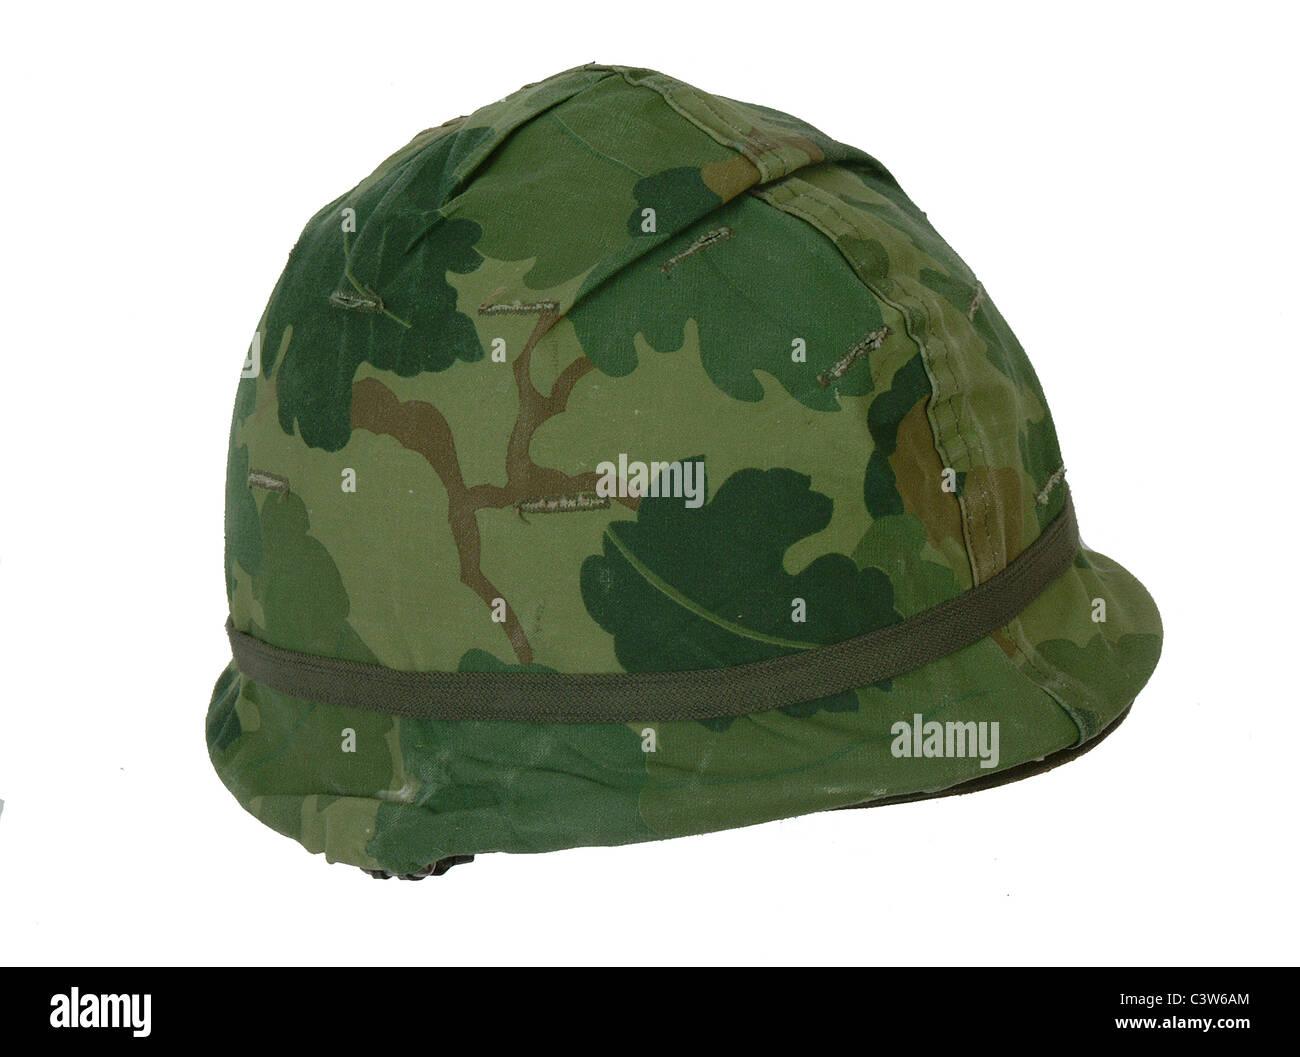 US Army M1 combat helmet from the Vietnam war. - Stock Image